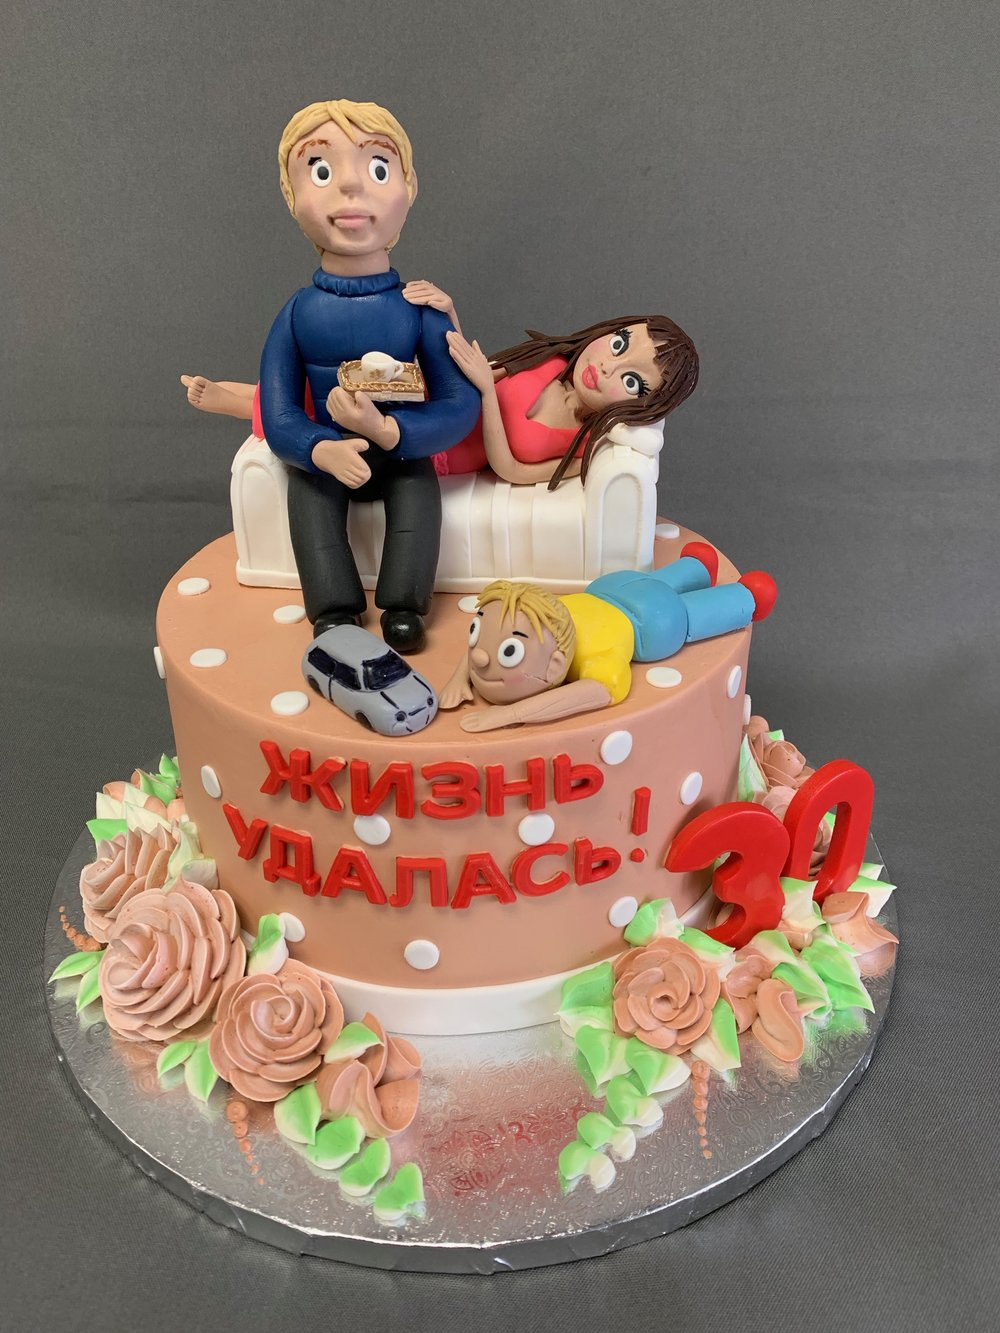 30th Birthday cake New Jersey